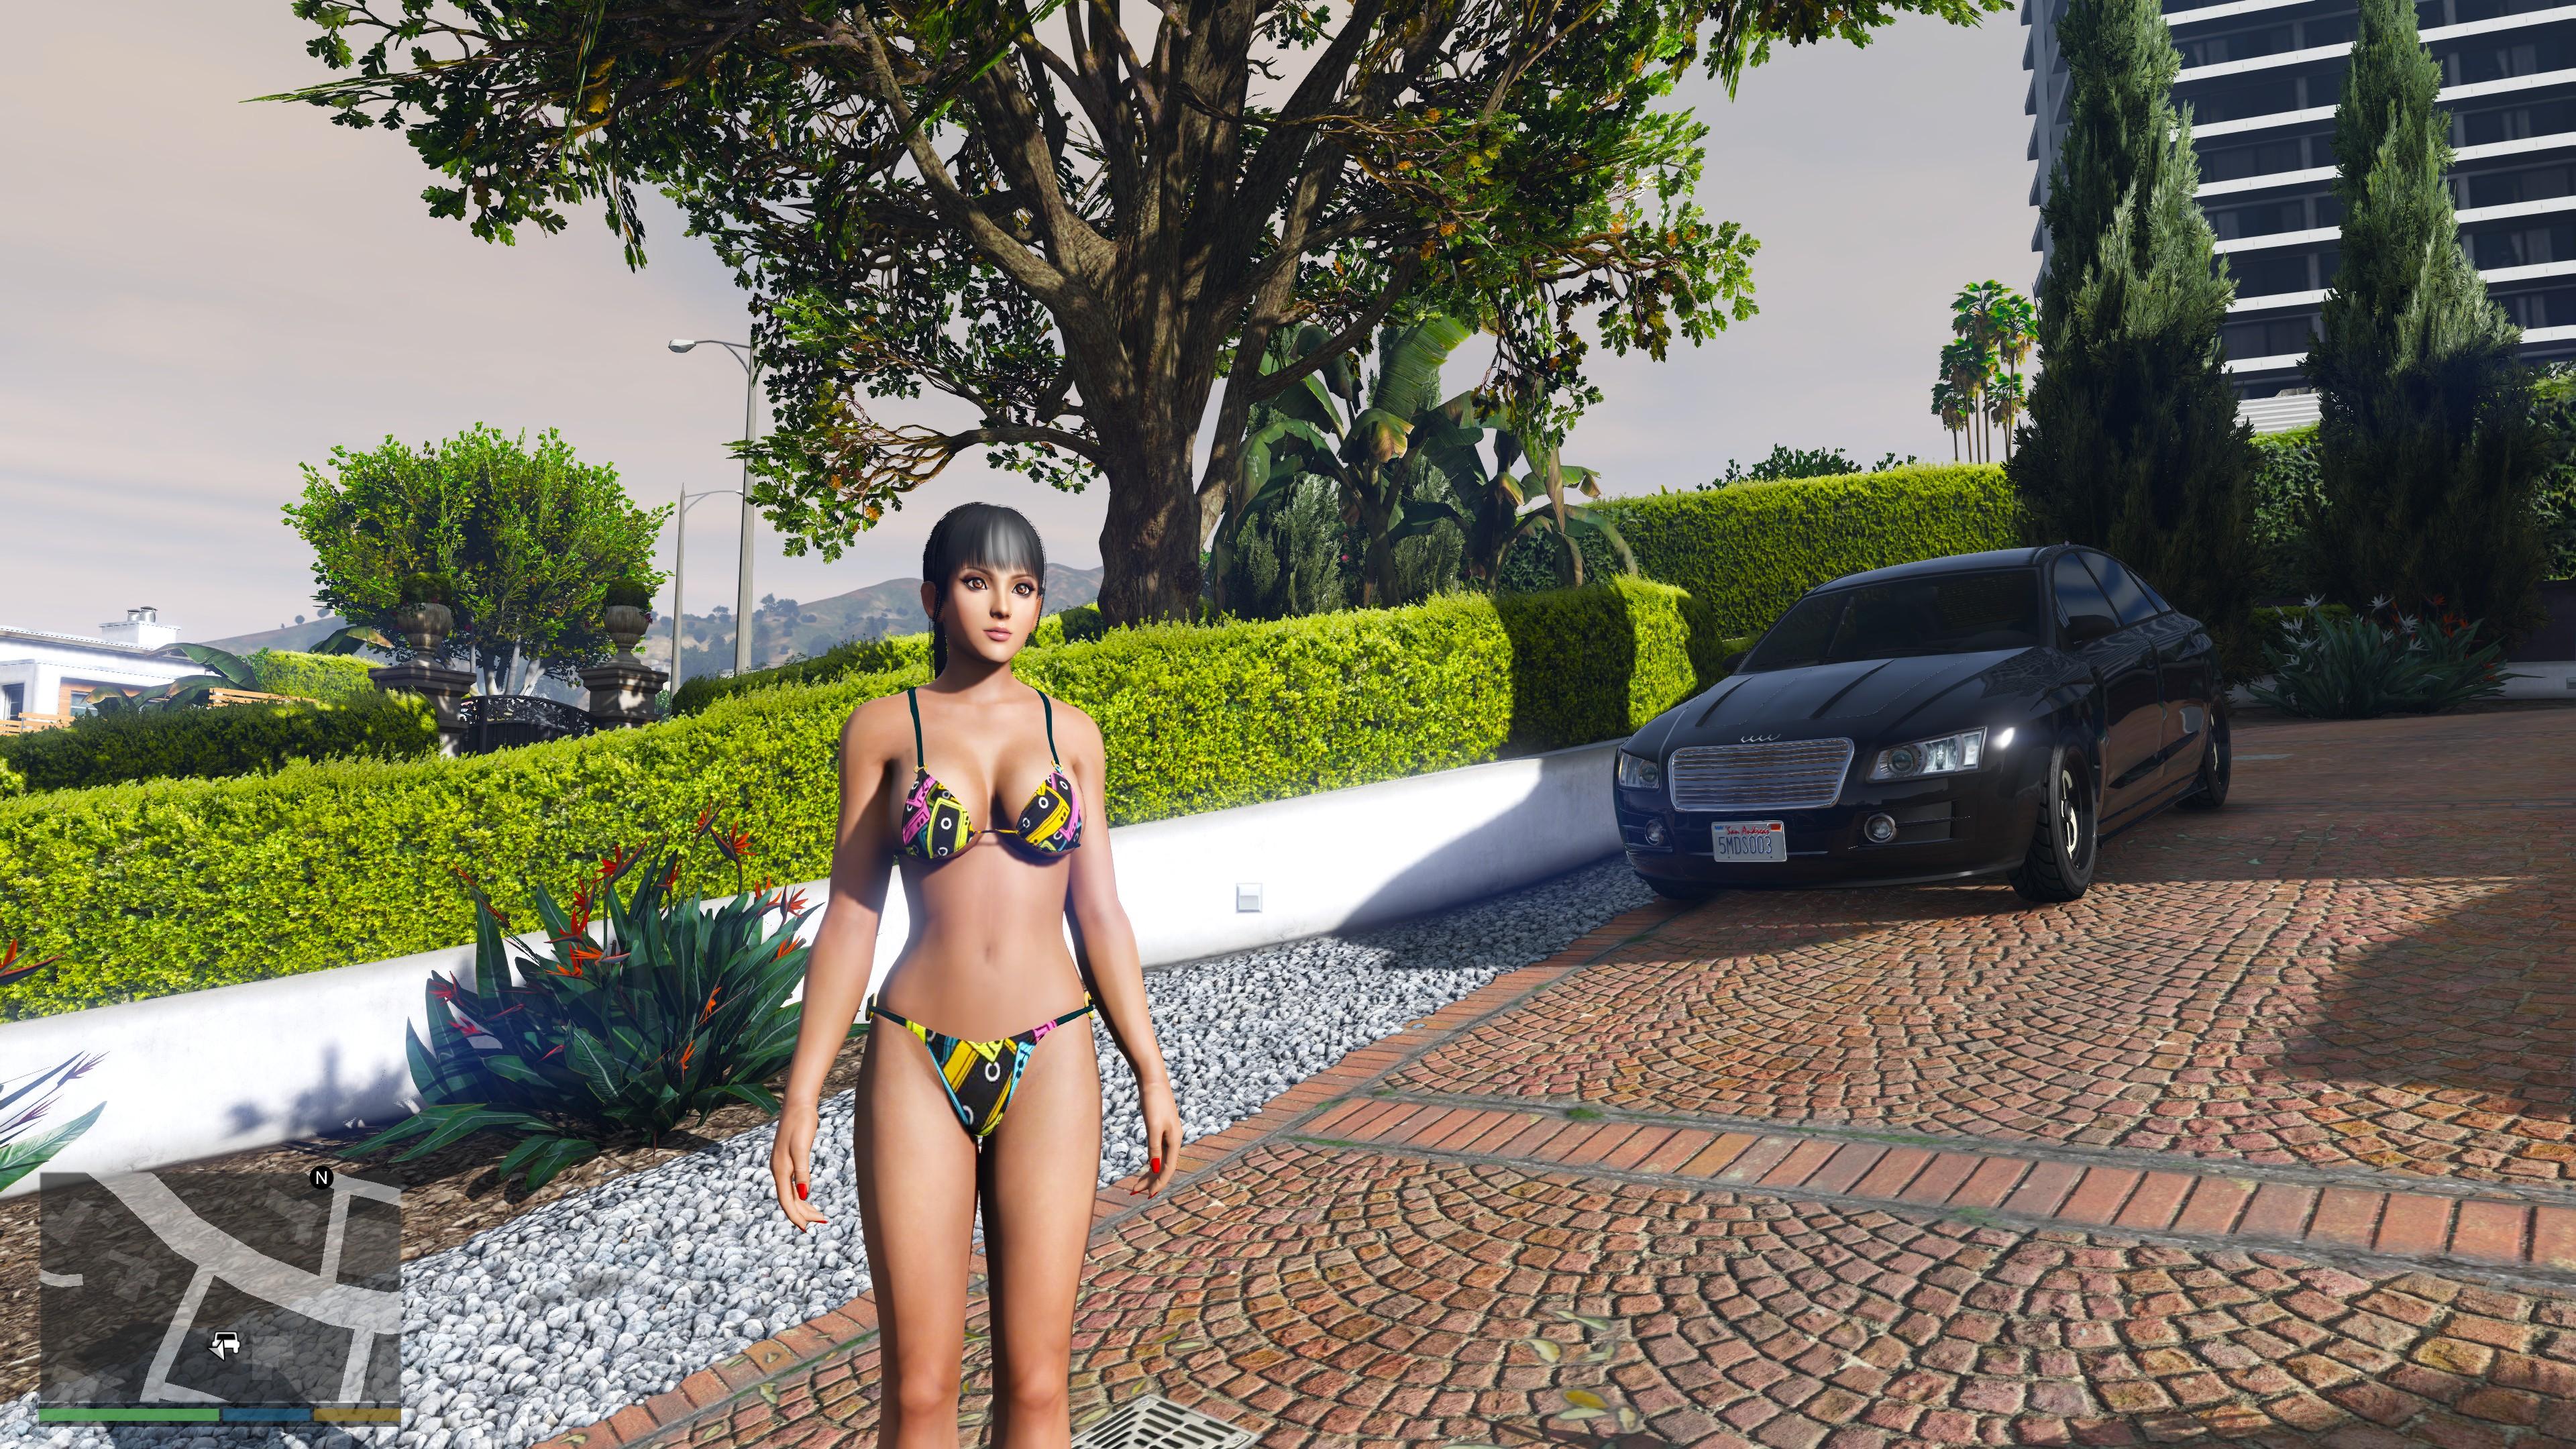 MIA - Grand Theft Auto 5